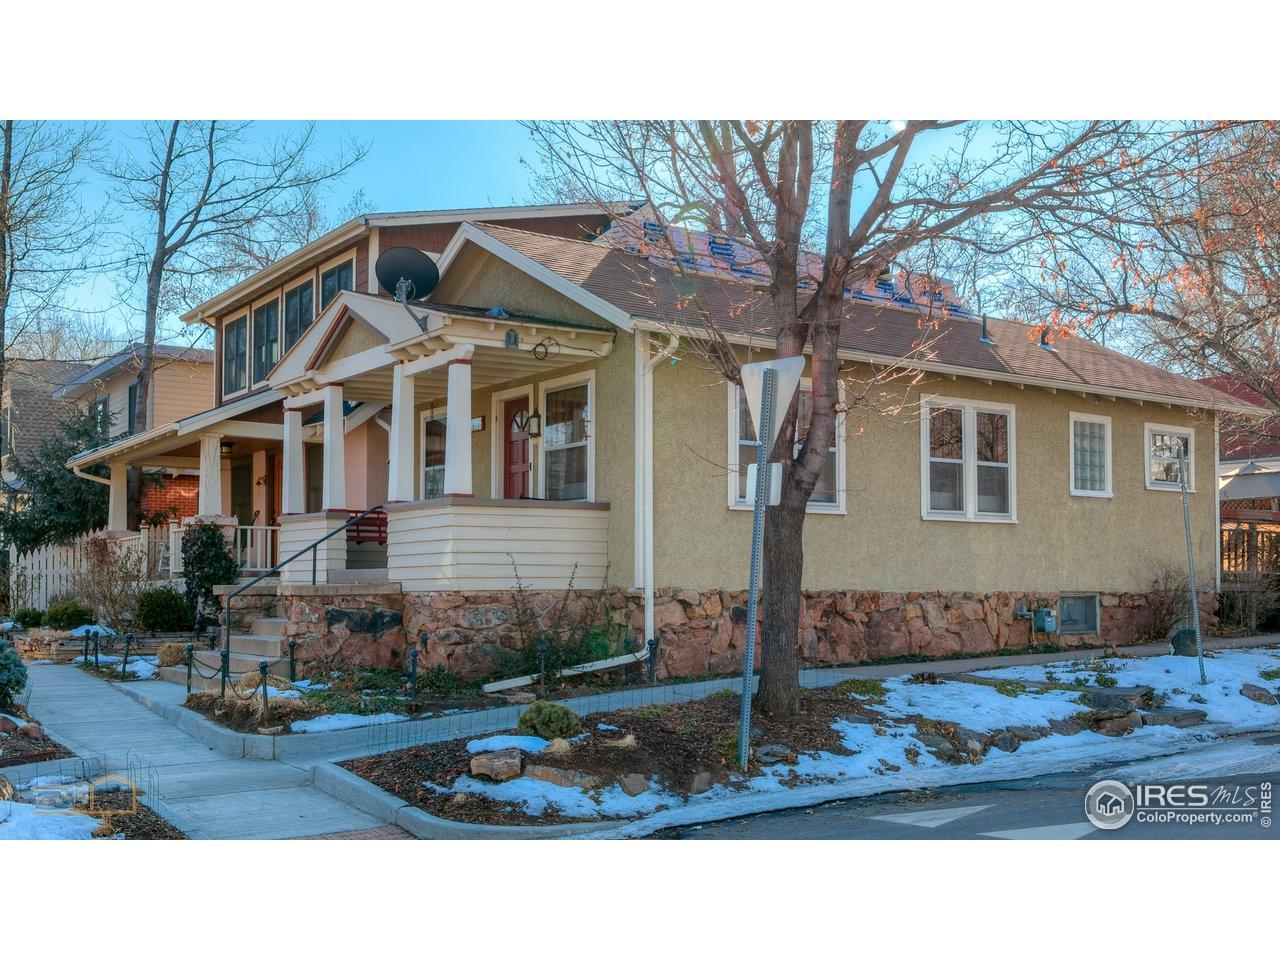 2455 6th St, Boulder CO 80304